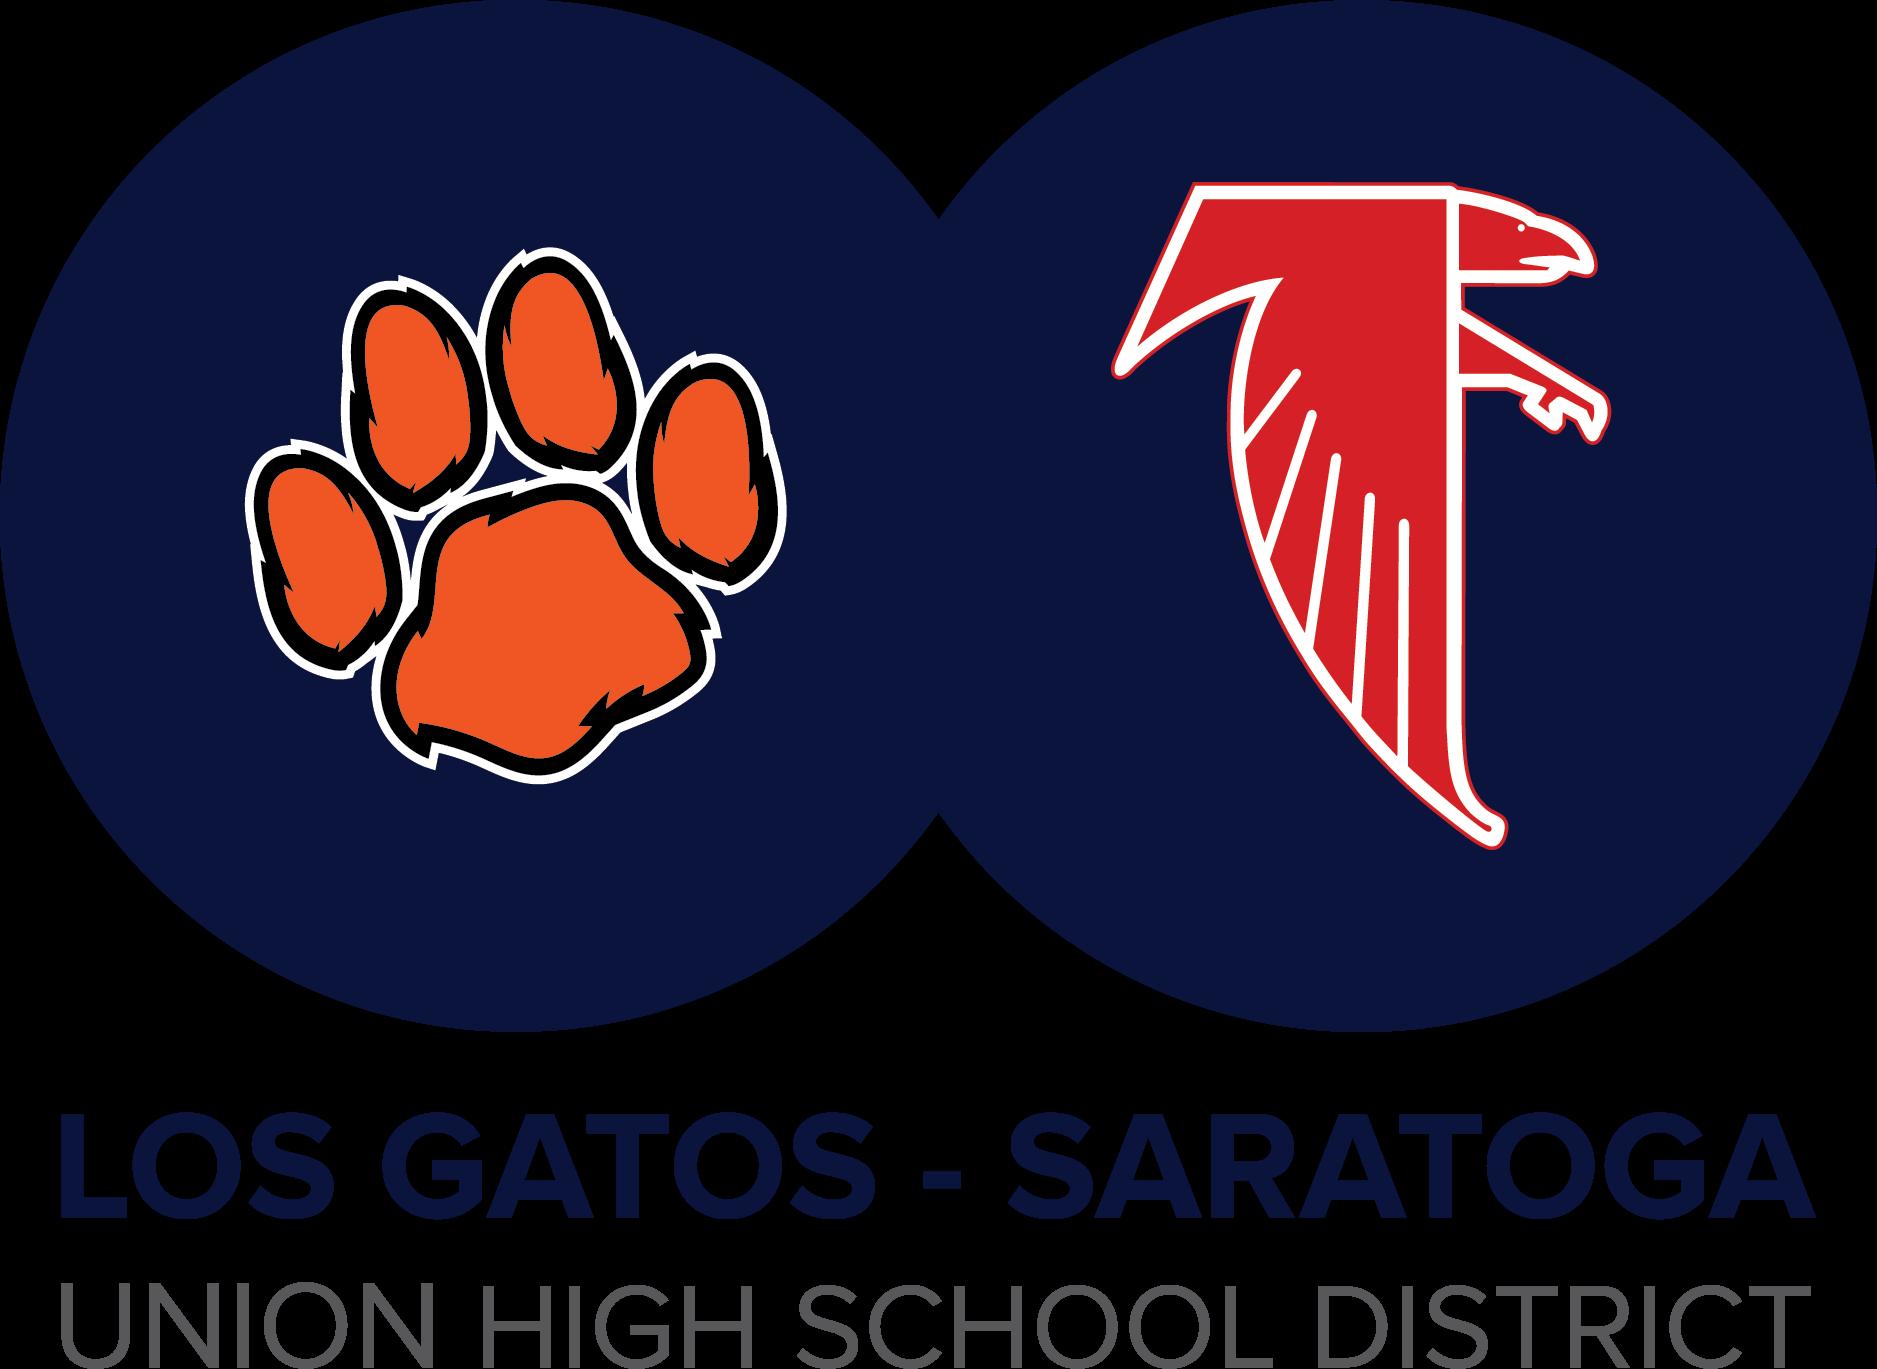 Los Gatos - Saratoga UHSD